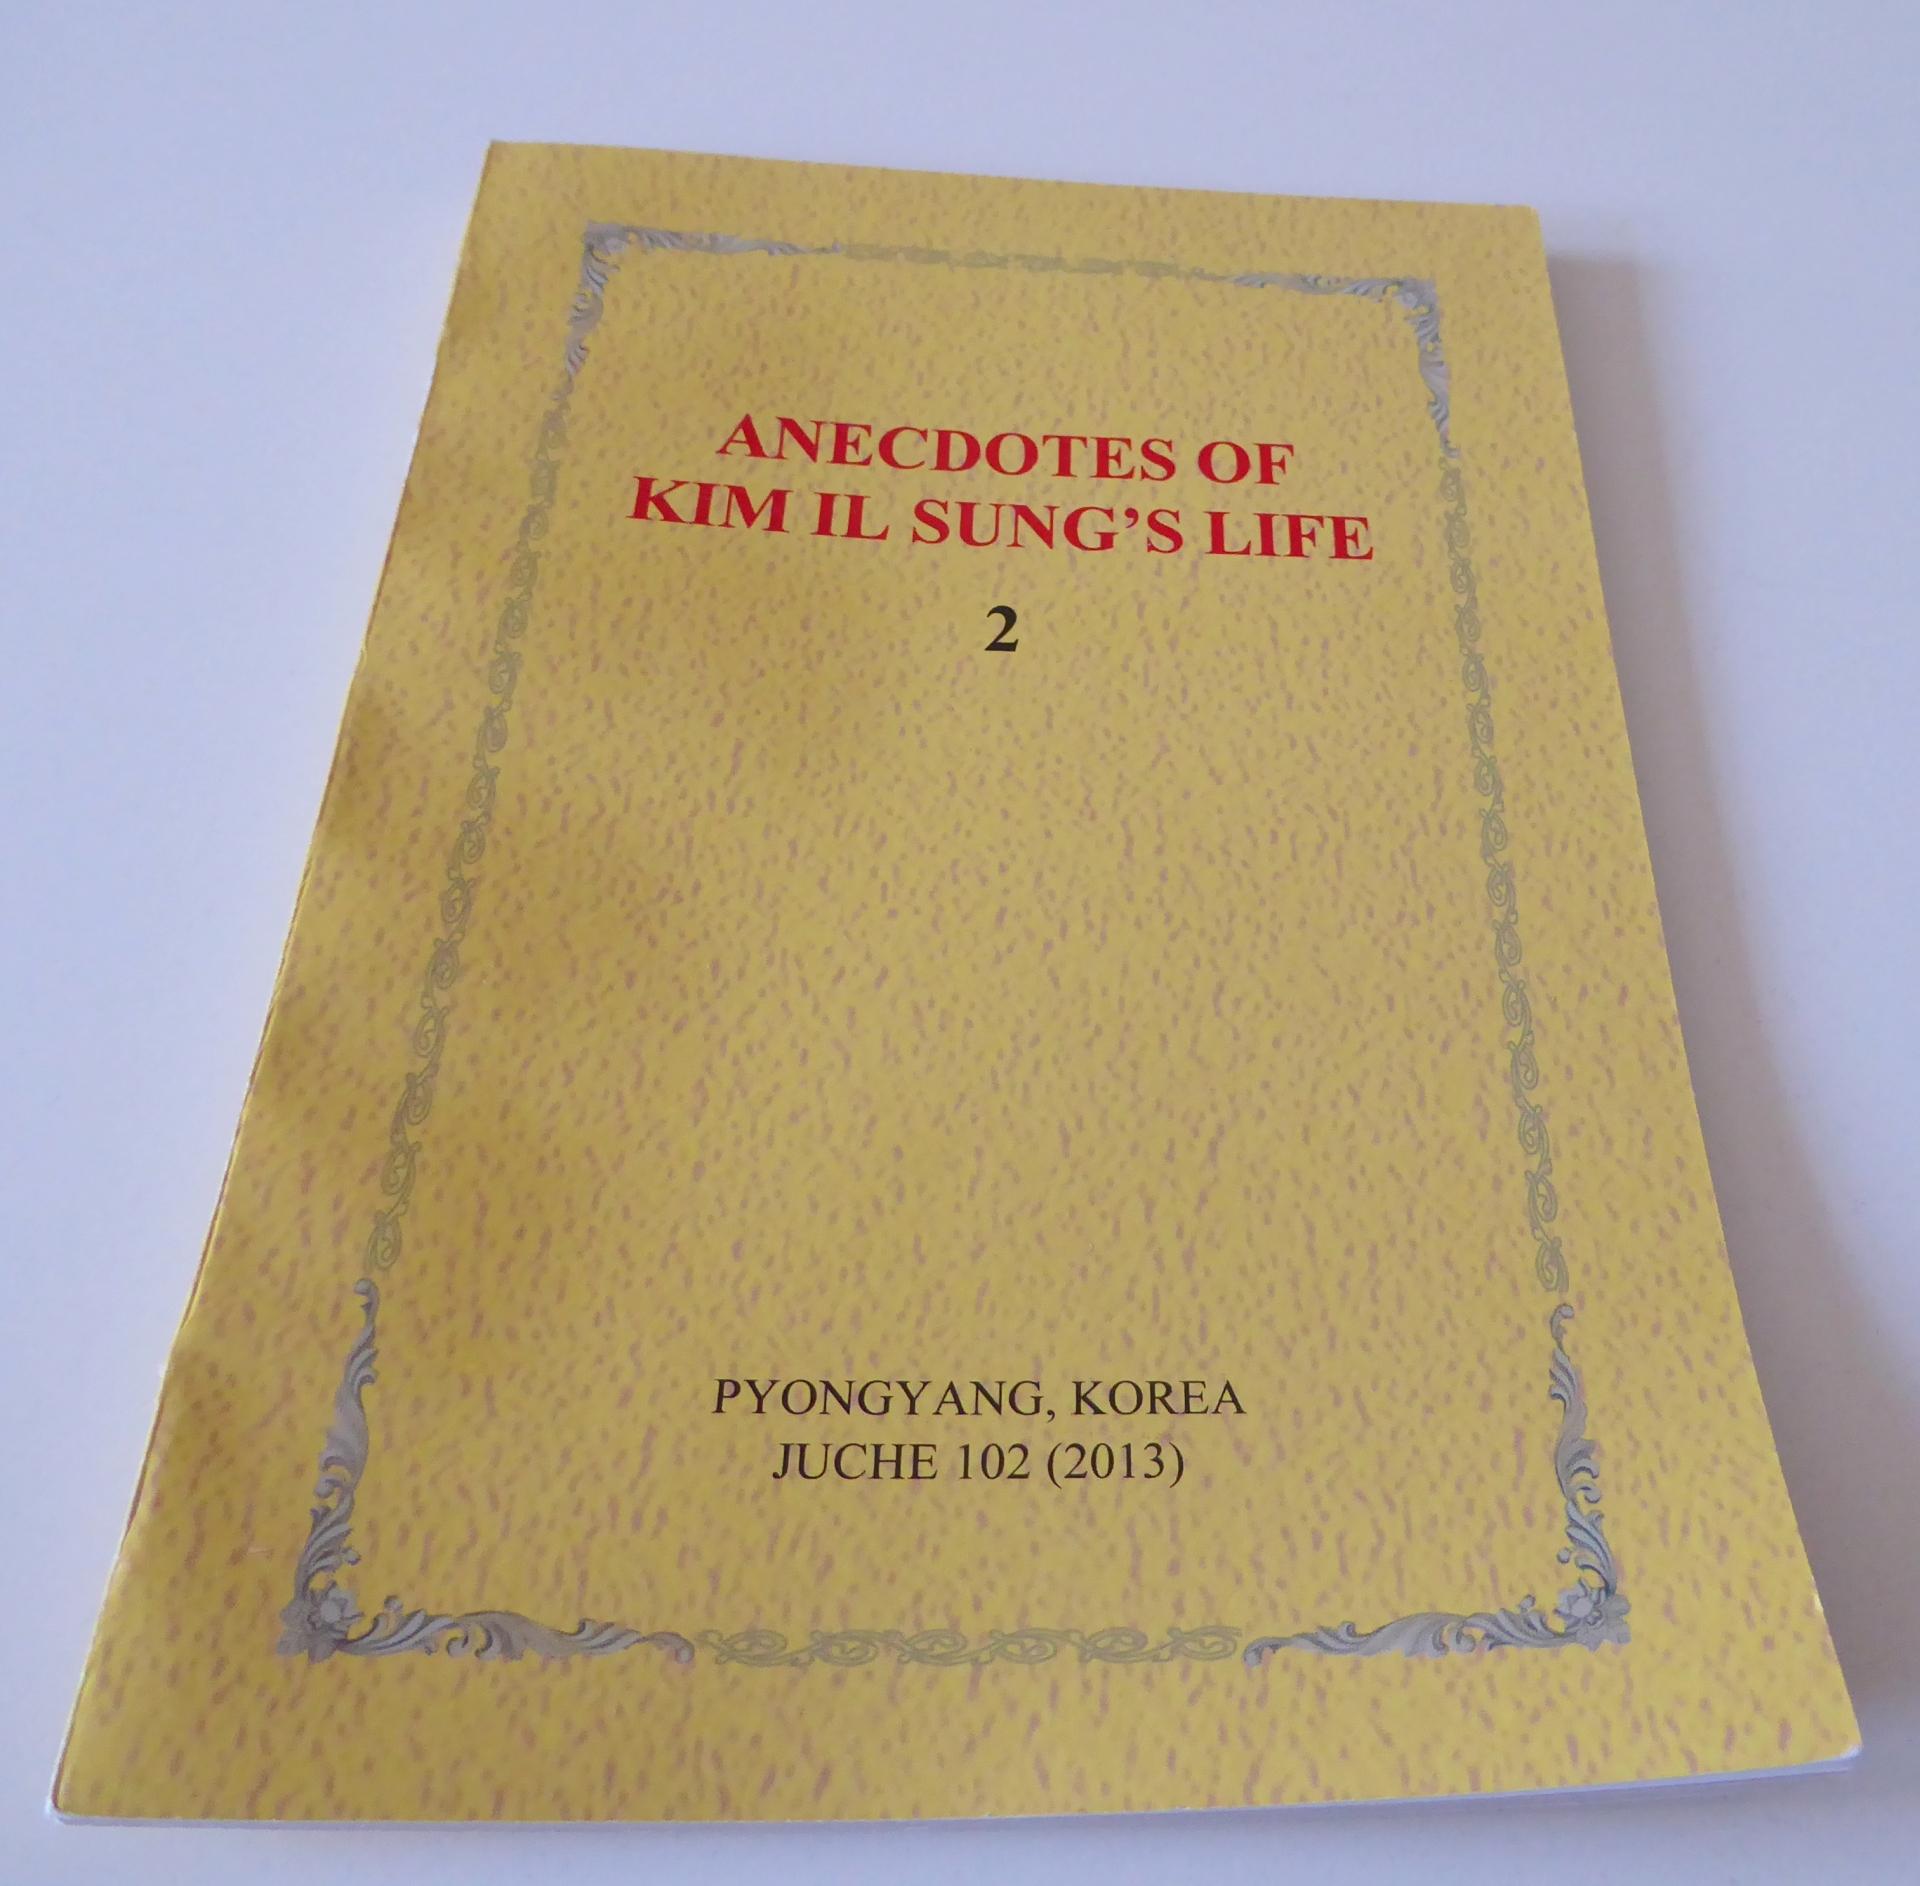 Anecdotes of Kim Il Sung's Life Book North Korea dprk souvenir souvenirs